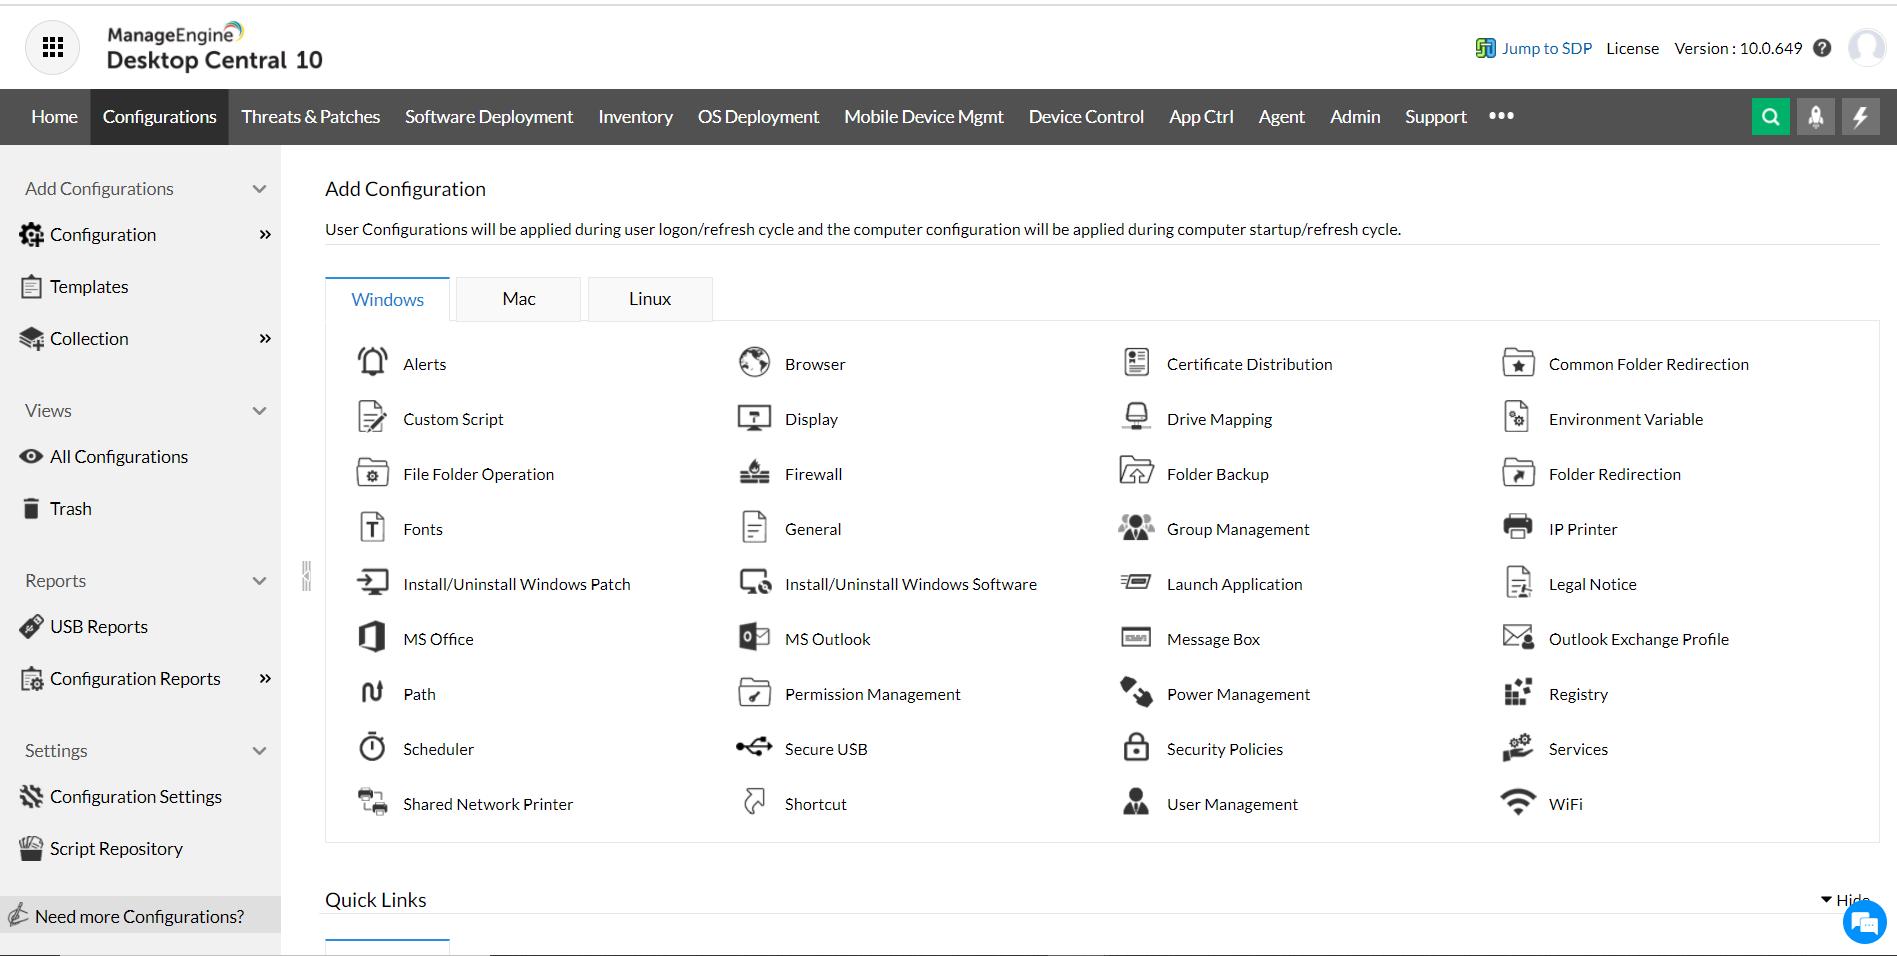 Computer configuration - ManageEngine Desktop Central Computer Configurations